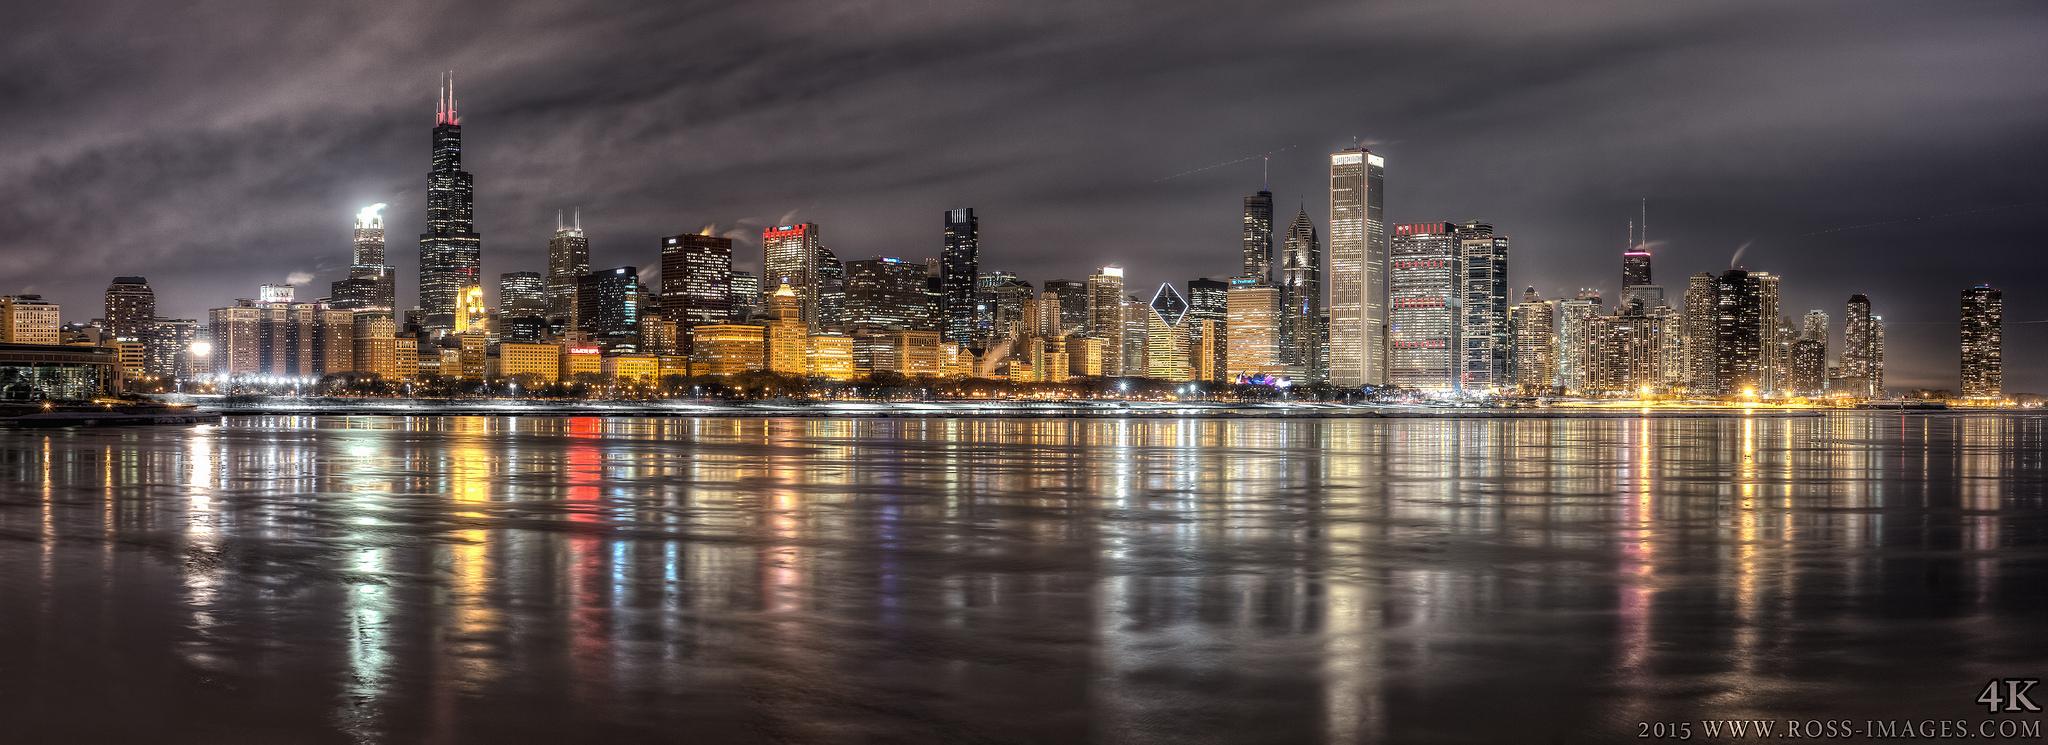 chicago skyline art - photo #29